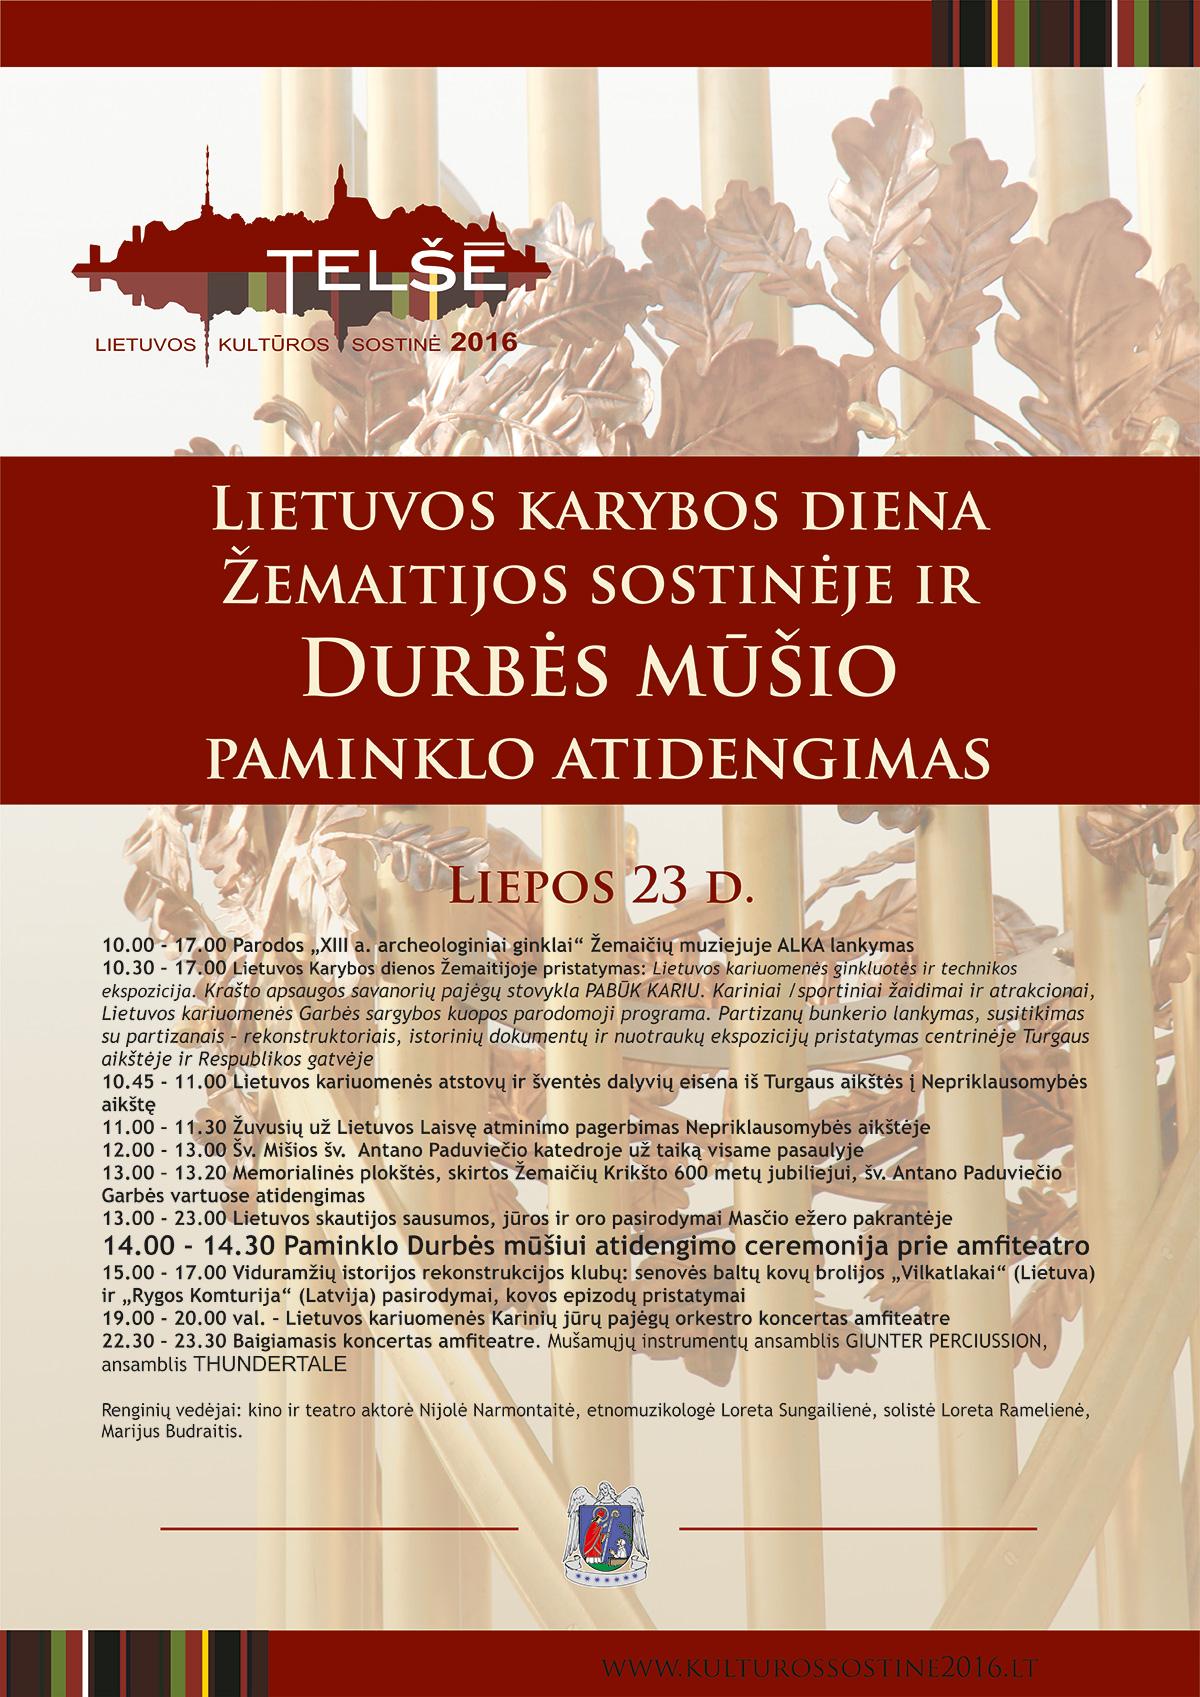 Liepos-23-diena-SPAUDA-kulturossostine2016-lt-nuotr